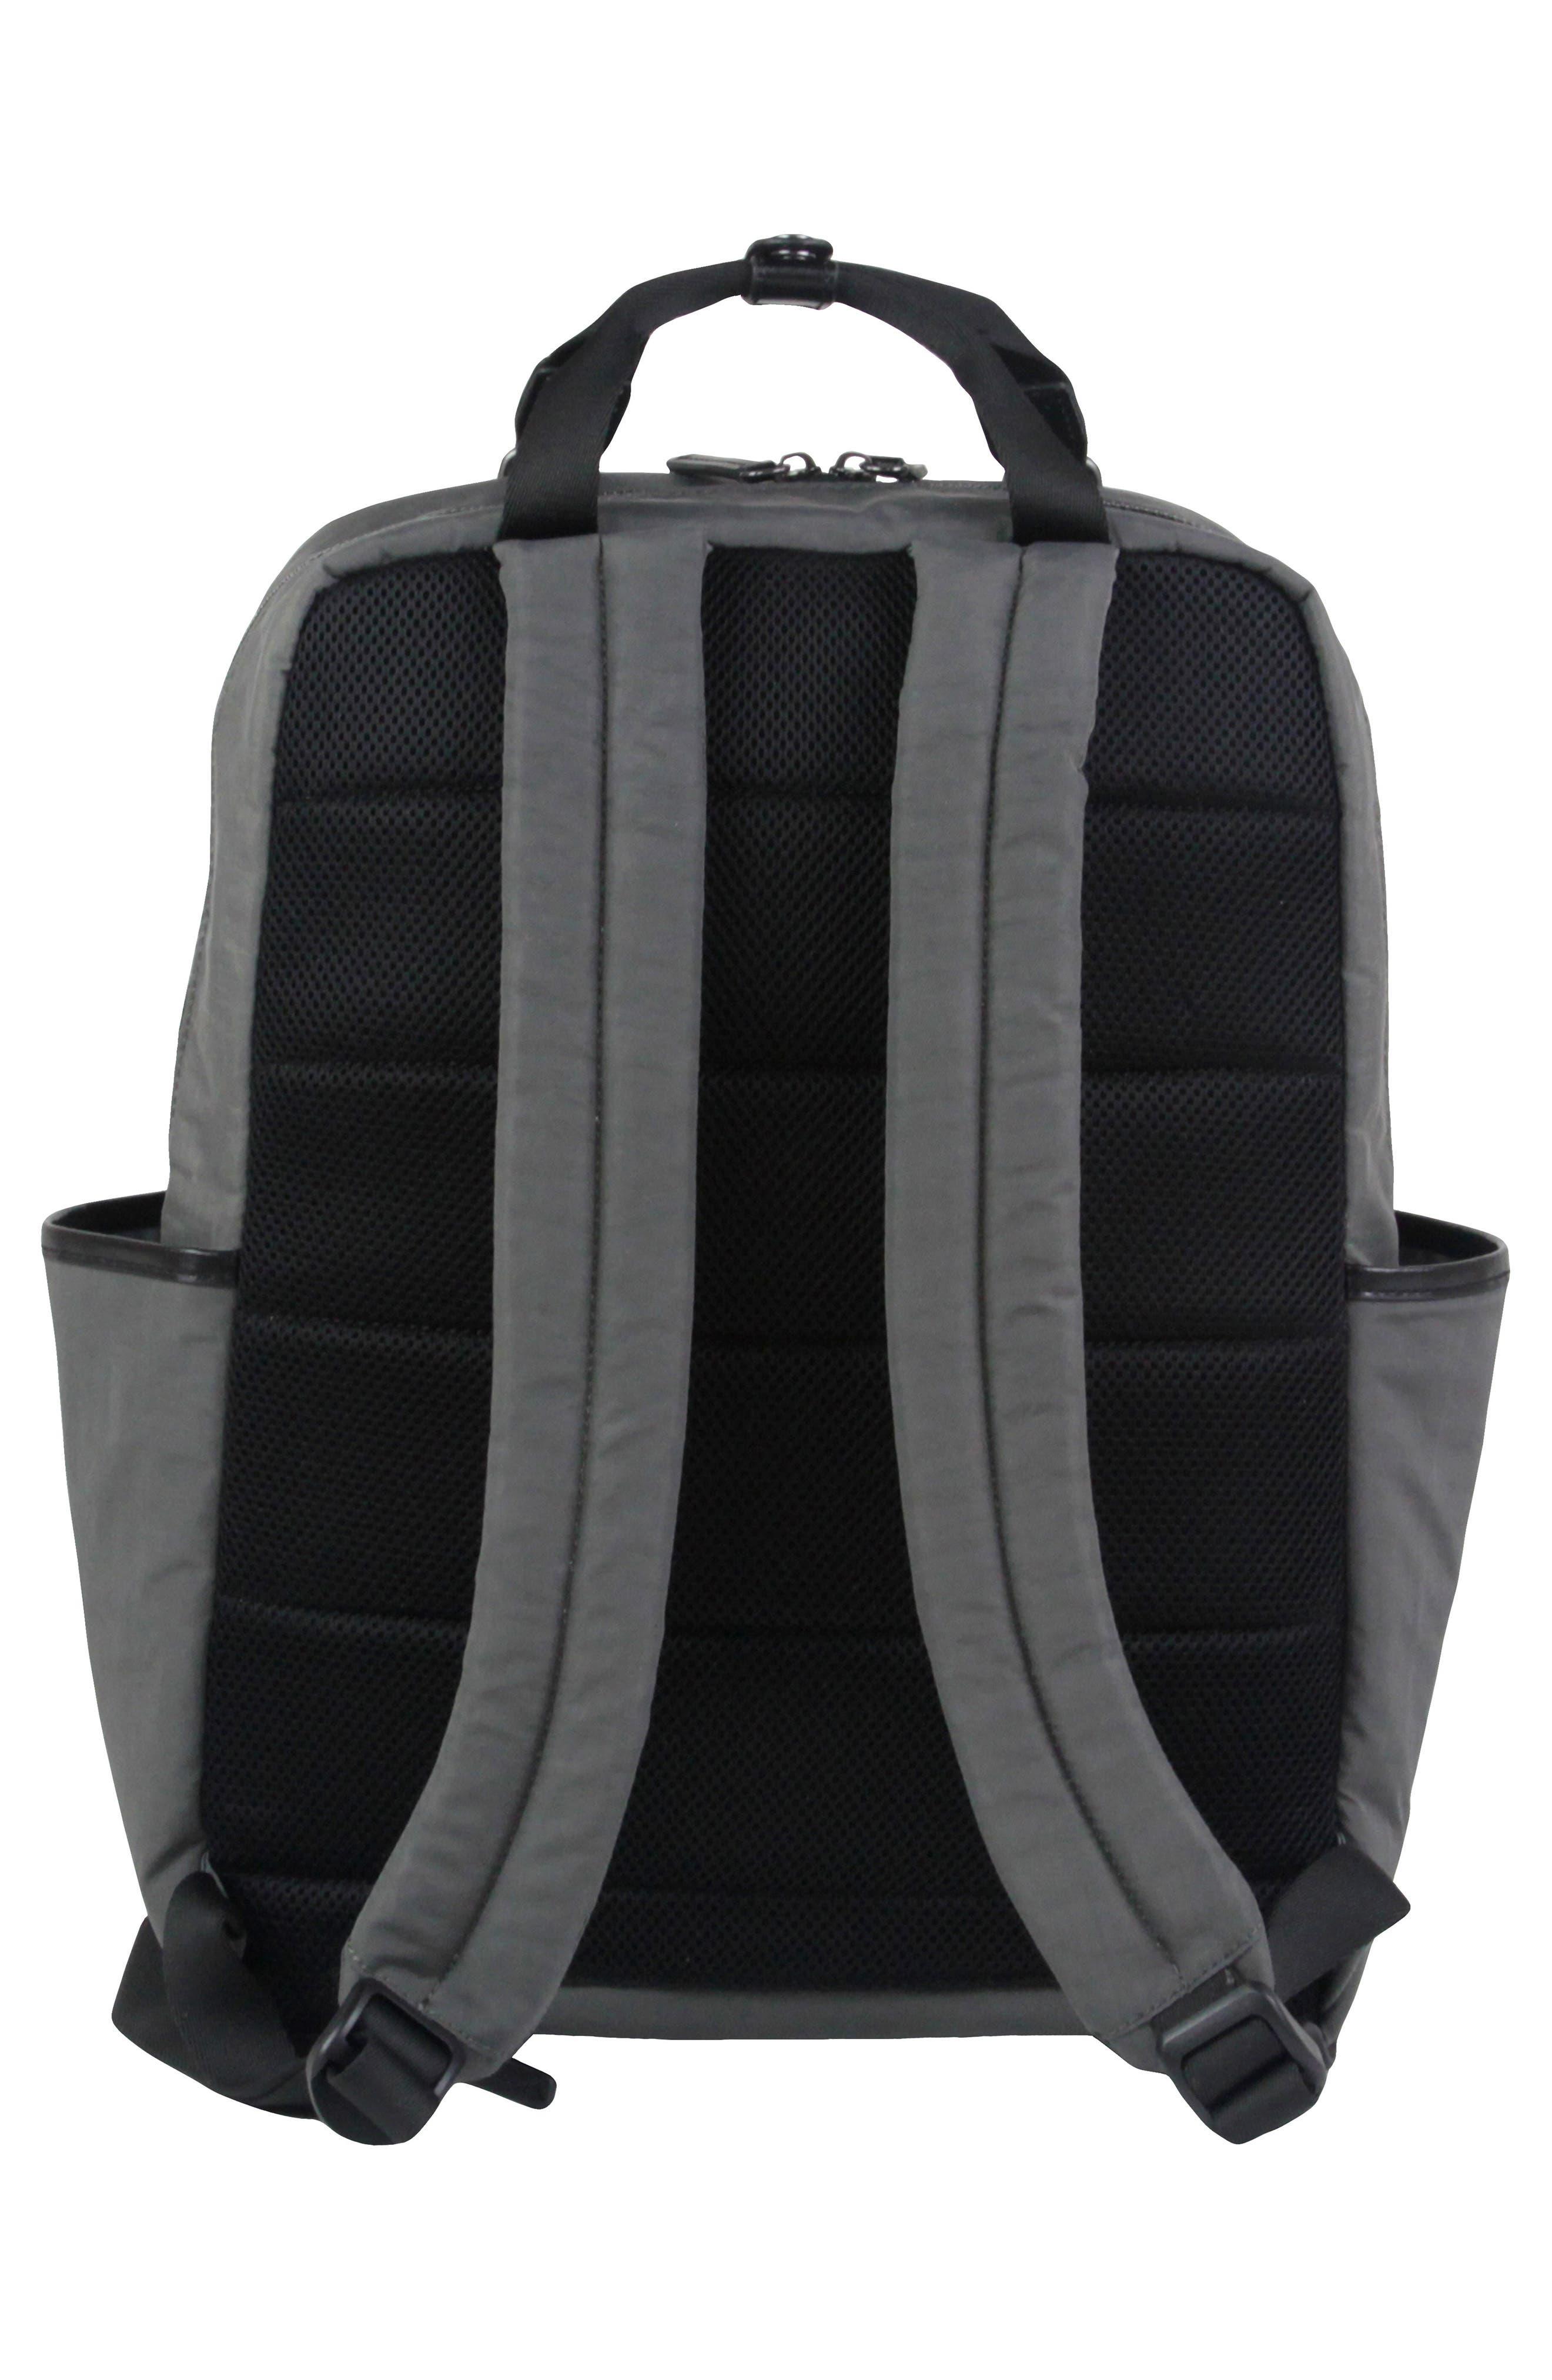 'Courage' Unisex Backpack Diaper Bag,                             Alternate thumbnail 2, color,                             DARK GREY